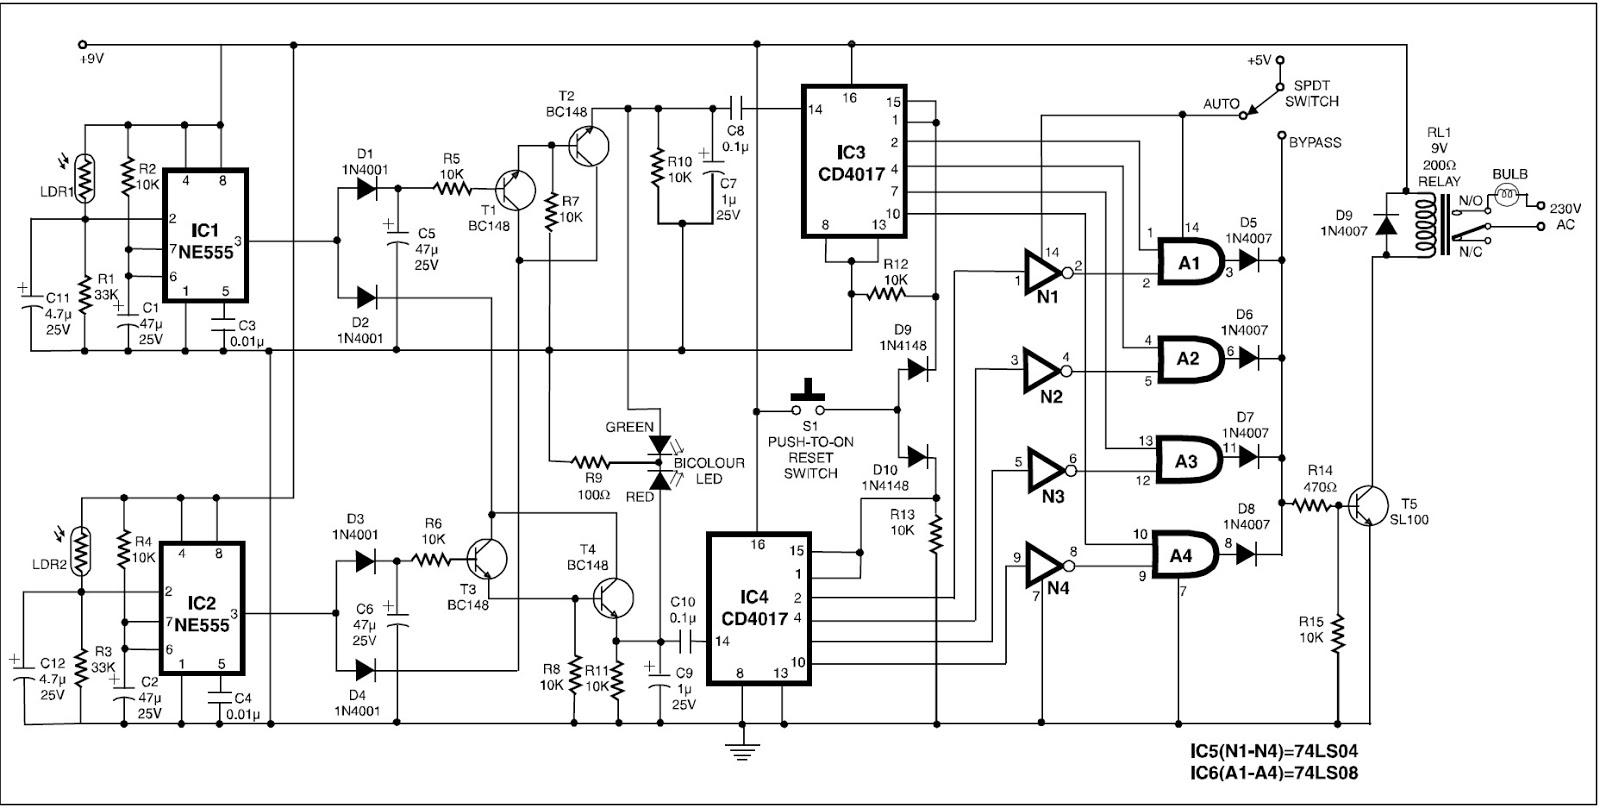 Million Circuits Auto Shut Off Tone Generator Circuit Automatic Room Power Control